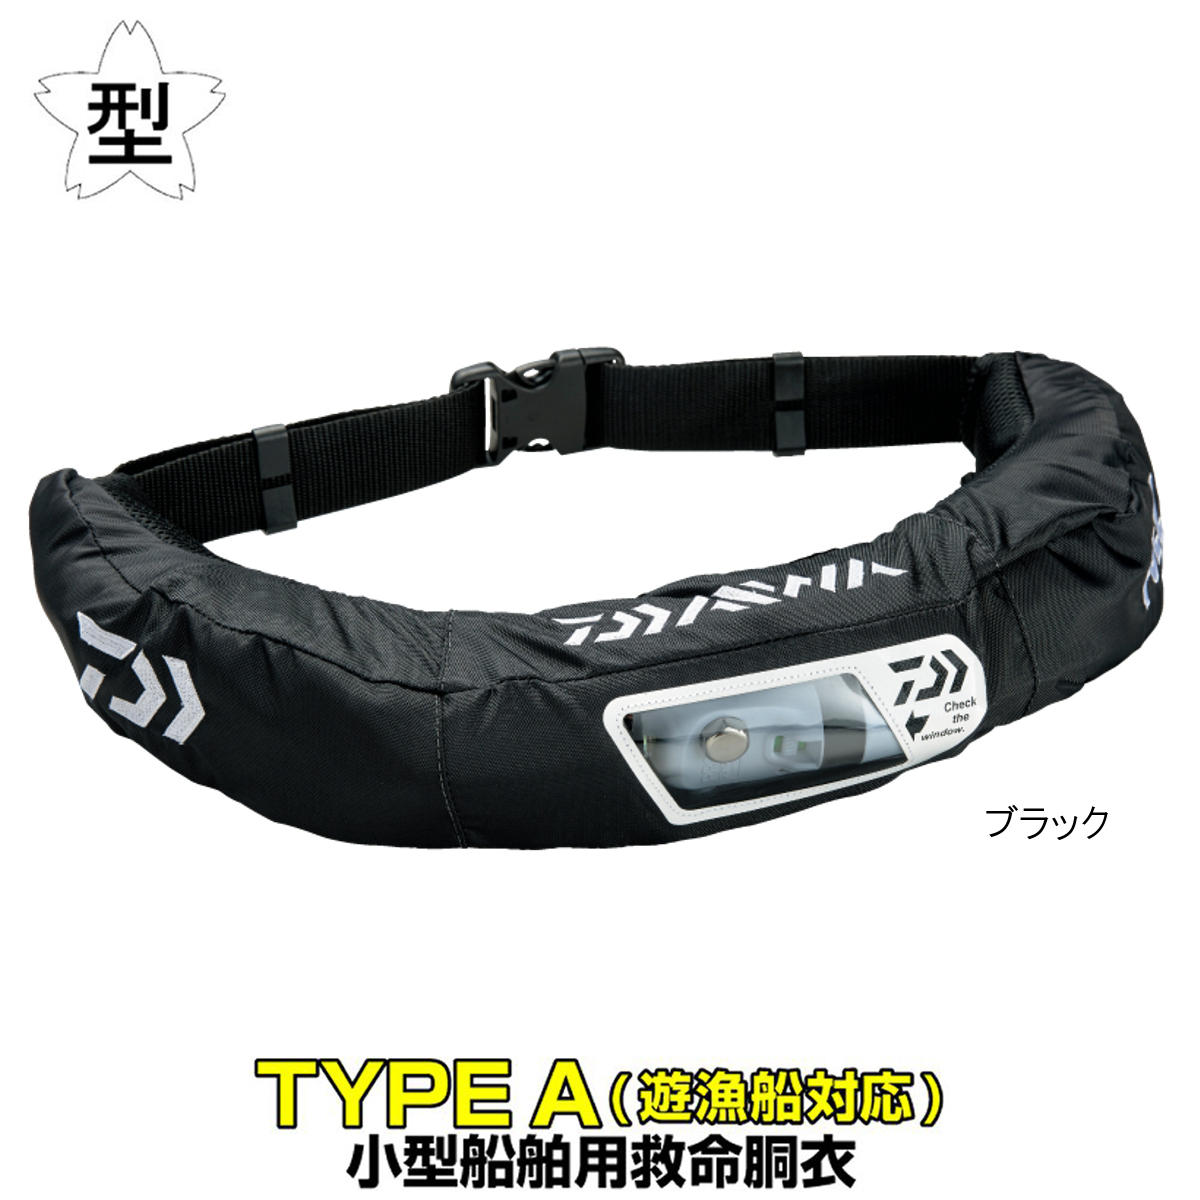 Kavu 903 90 Mens 1.5 Web Belt With Metal Buckle Brown /& Khaki Medium